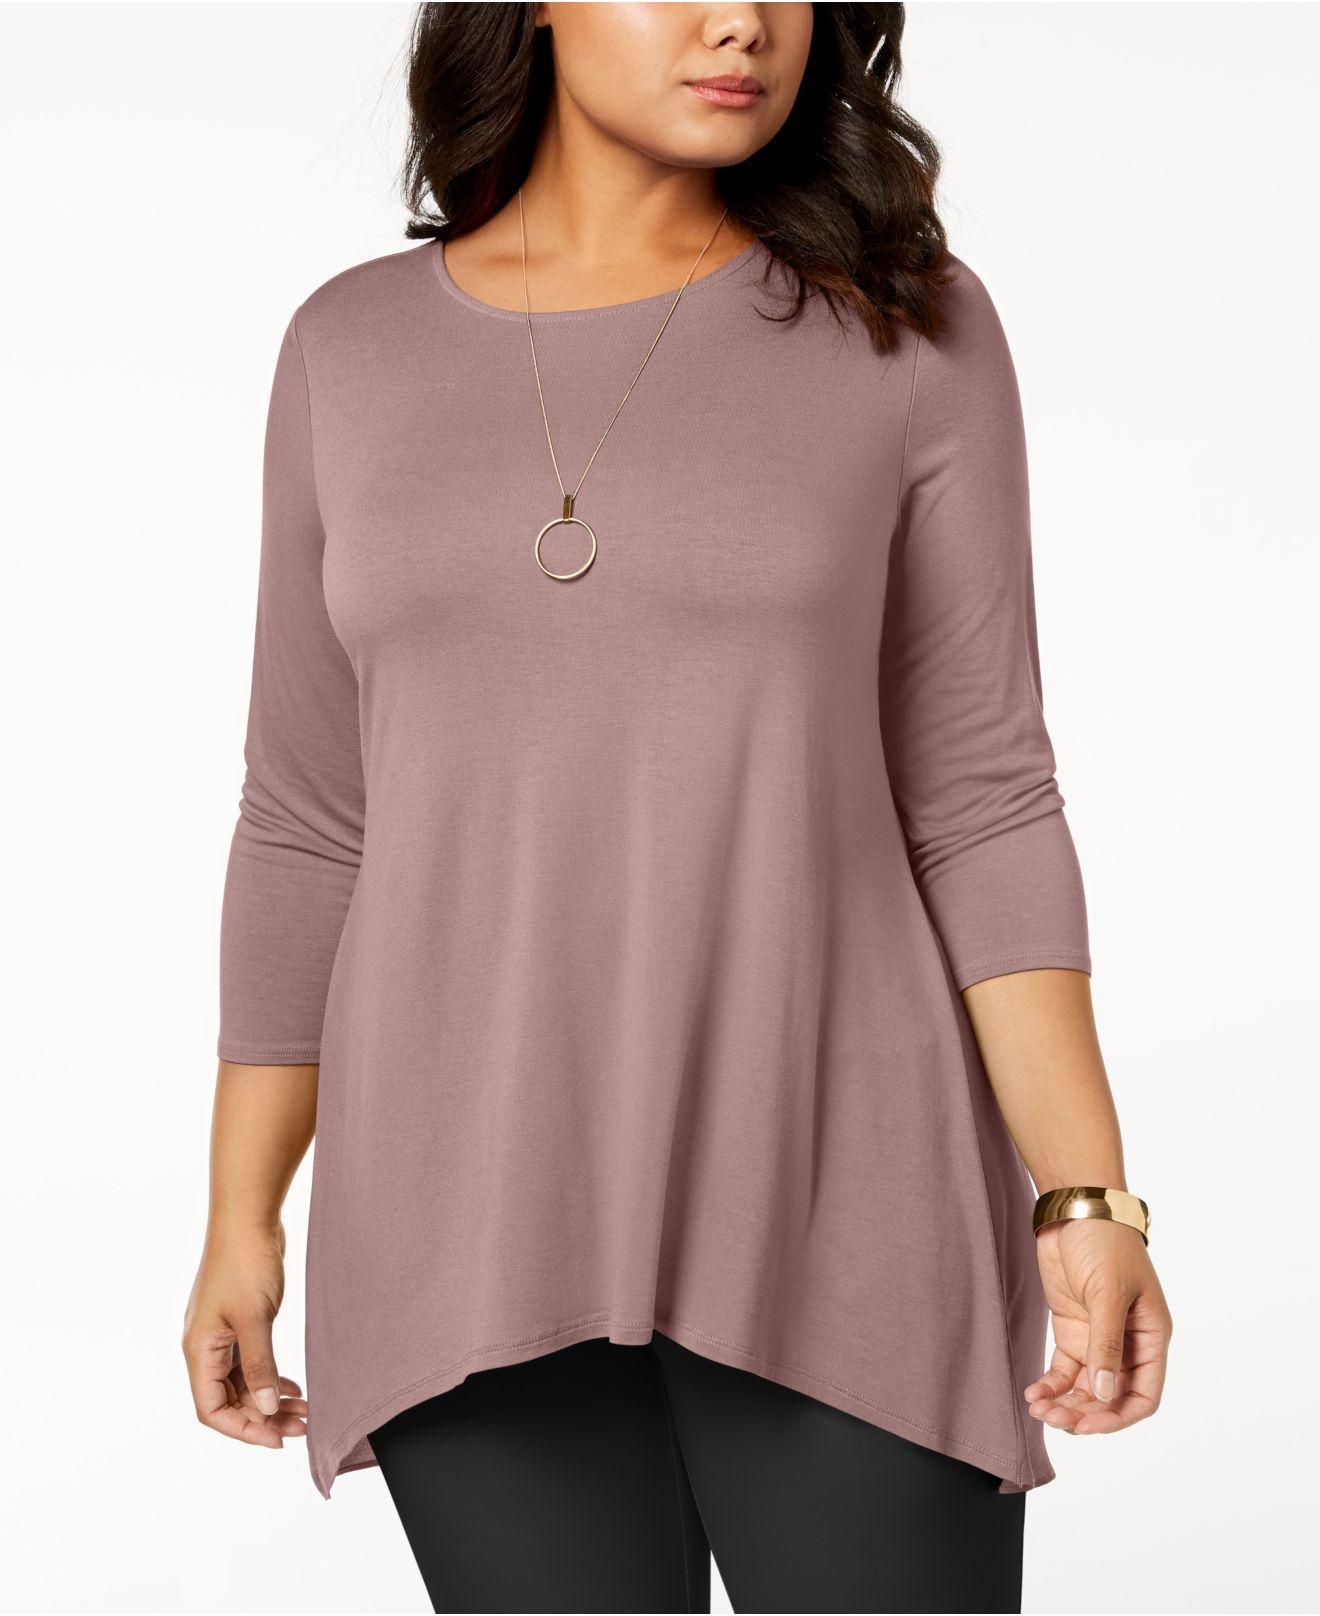 94281eb2ab2 Alfani. Women s Plus Size Woven-back Top ...